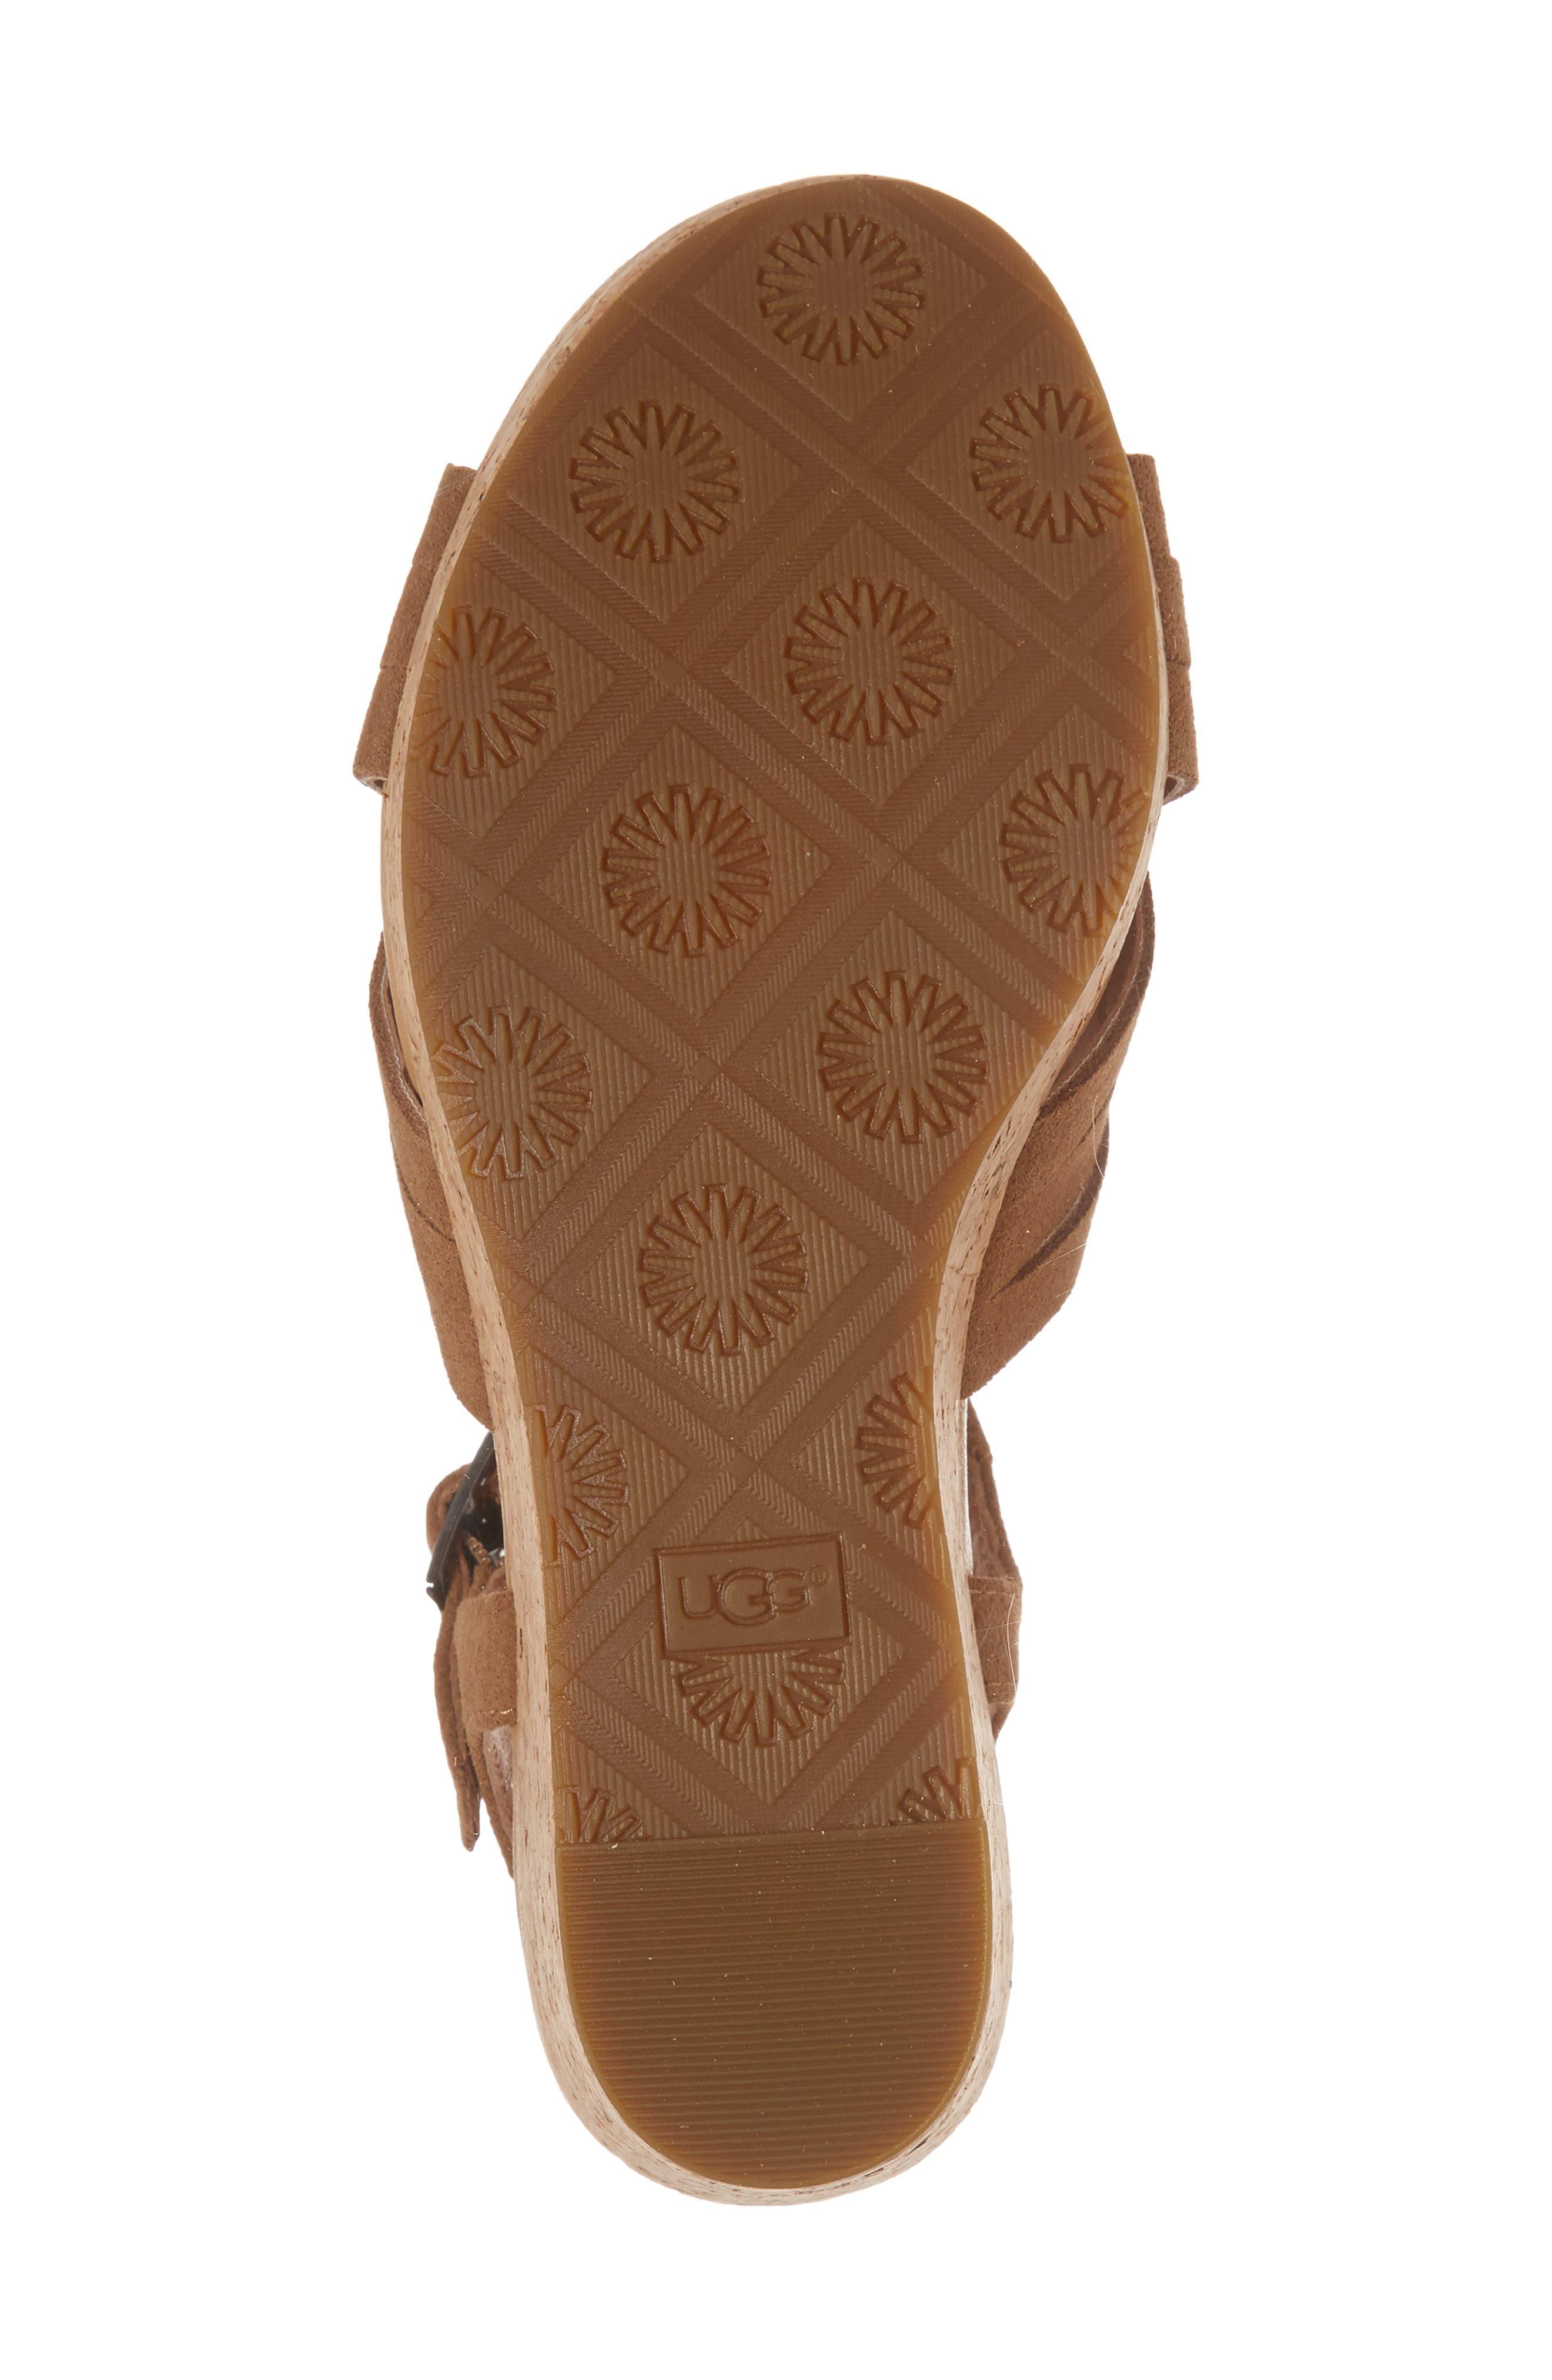 Uma Wedge Sandal,                             Alternate thumbnail 6, color,                             Chestnut Suede